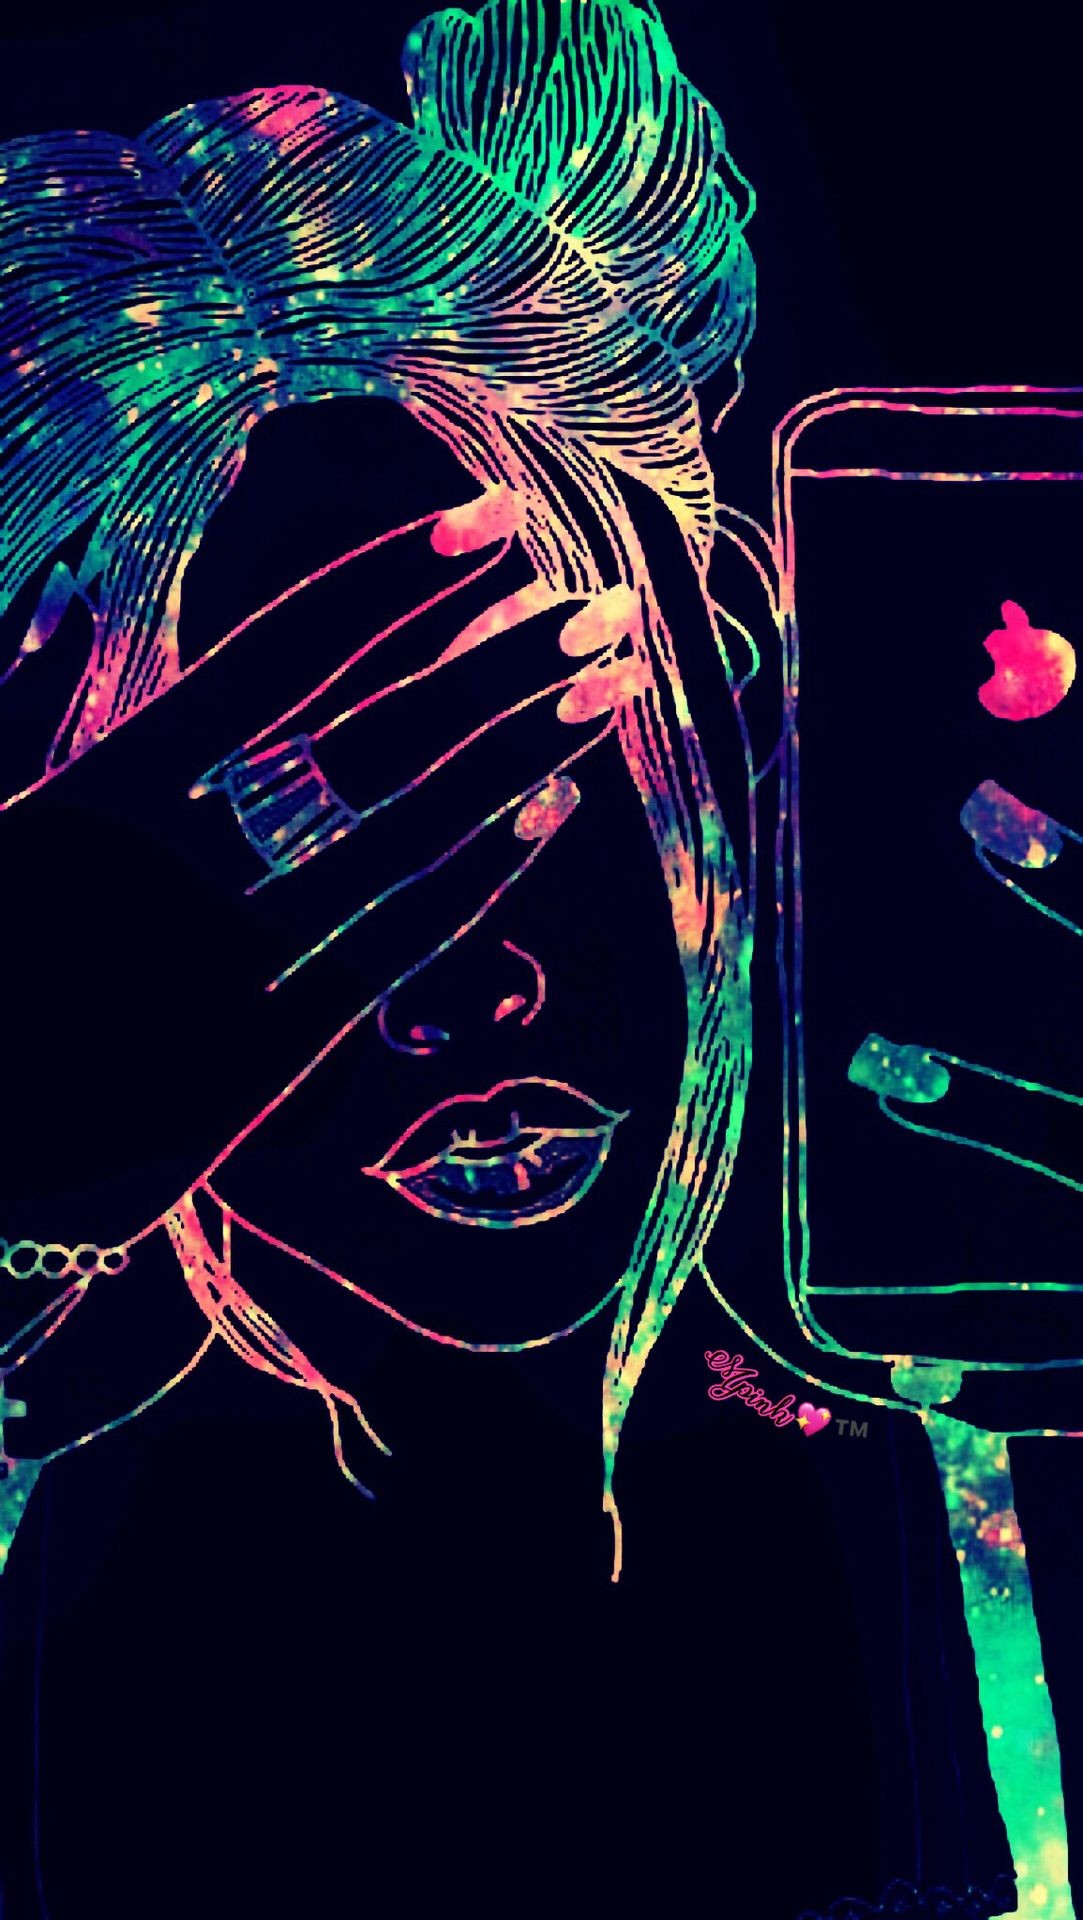 Res: 1083x1920, Cool Girl Galaxy Wallpaper #androidwallpaper #iphonewallpaper #wallpaper # galaxy #sparkle #glitter